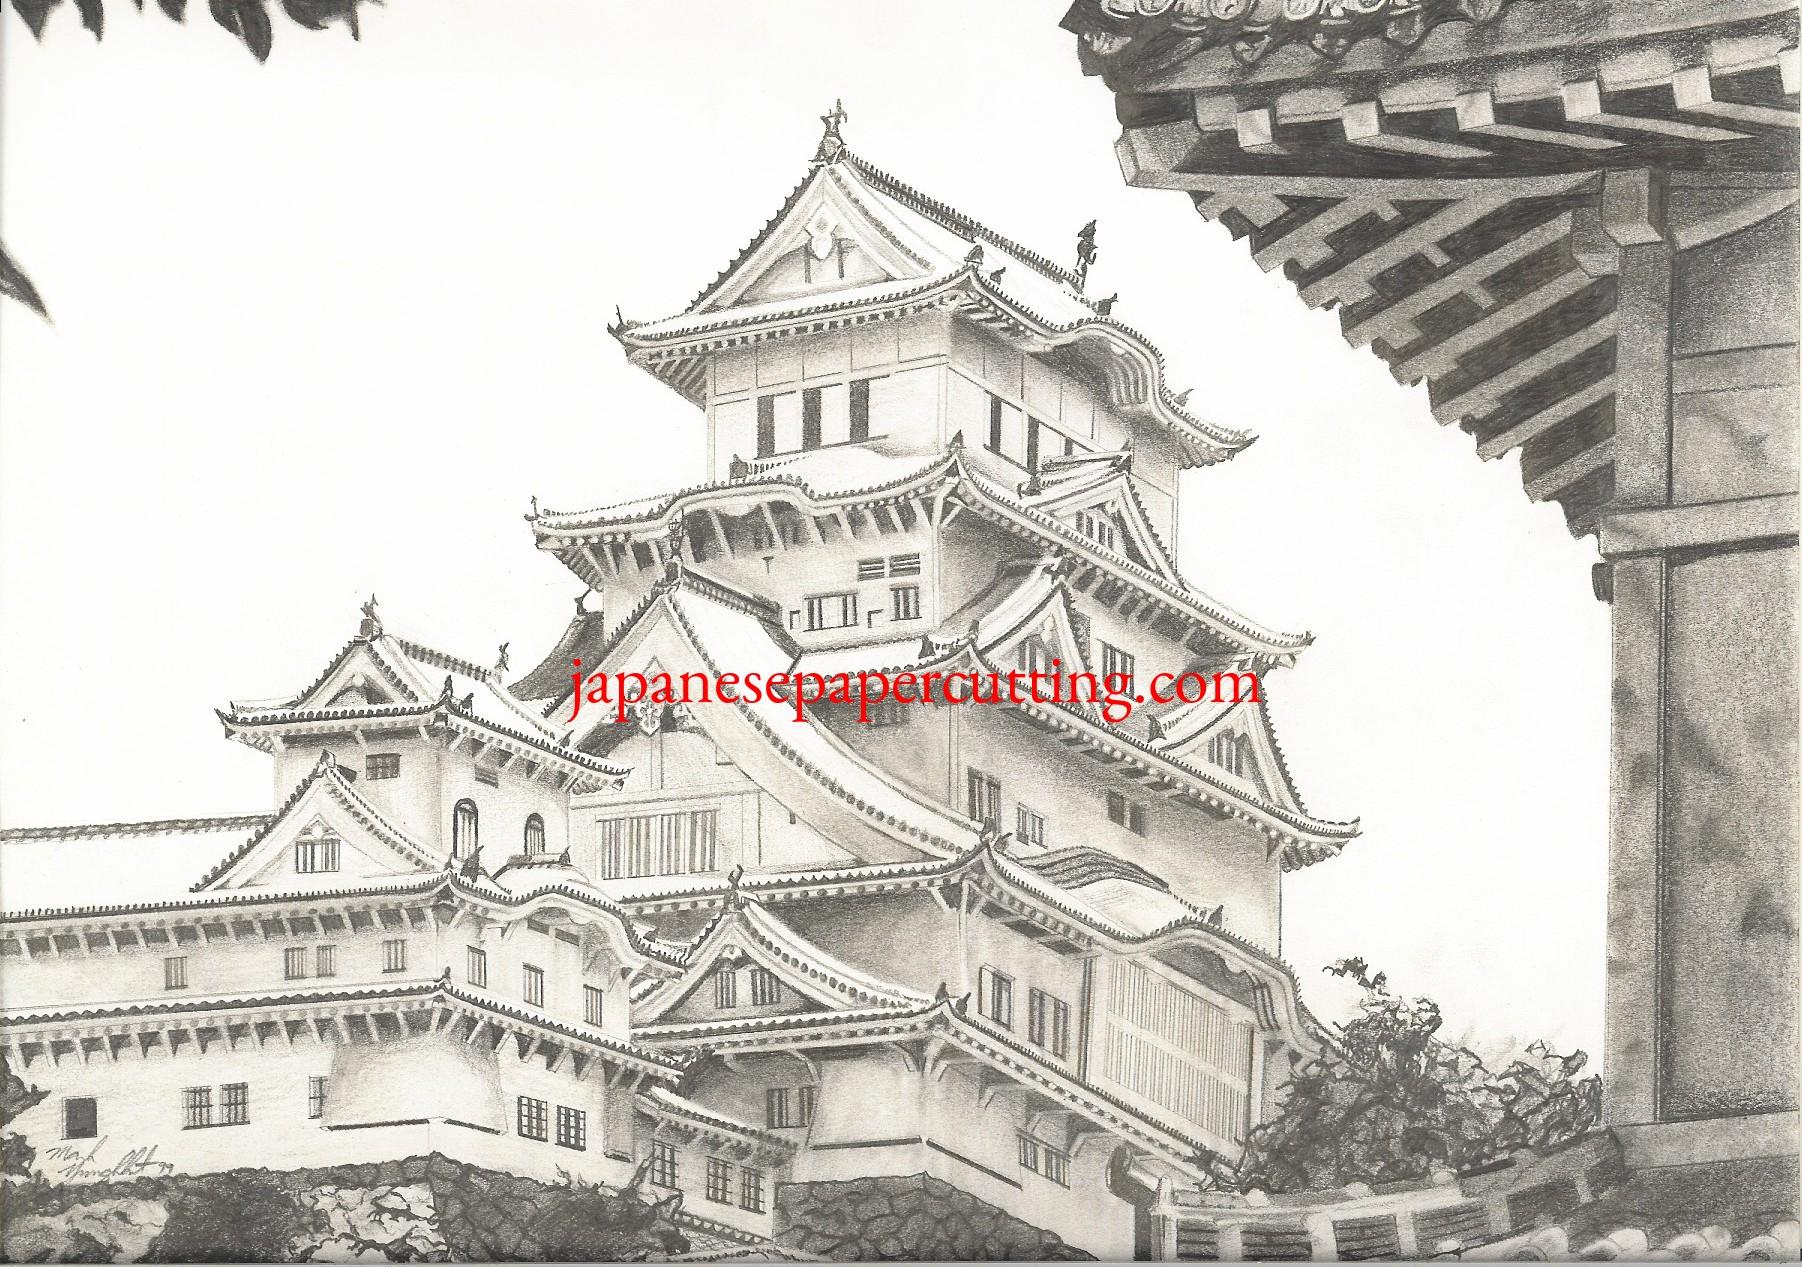 Himeji Castle   Himeji, Hyogo, Japan   Pencil   1999